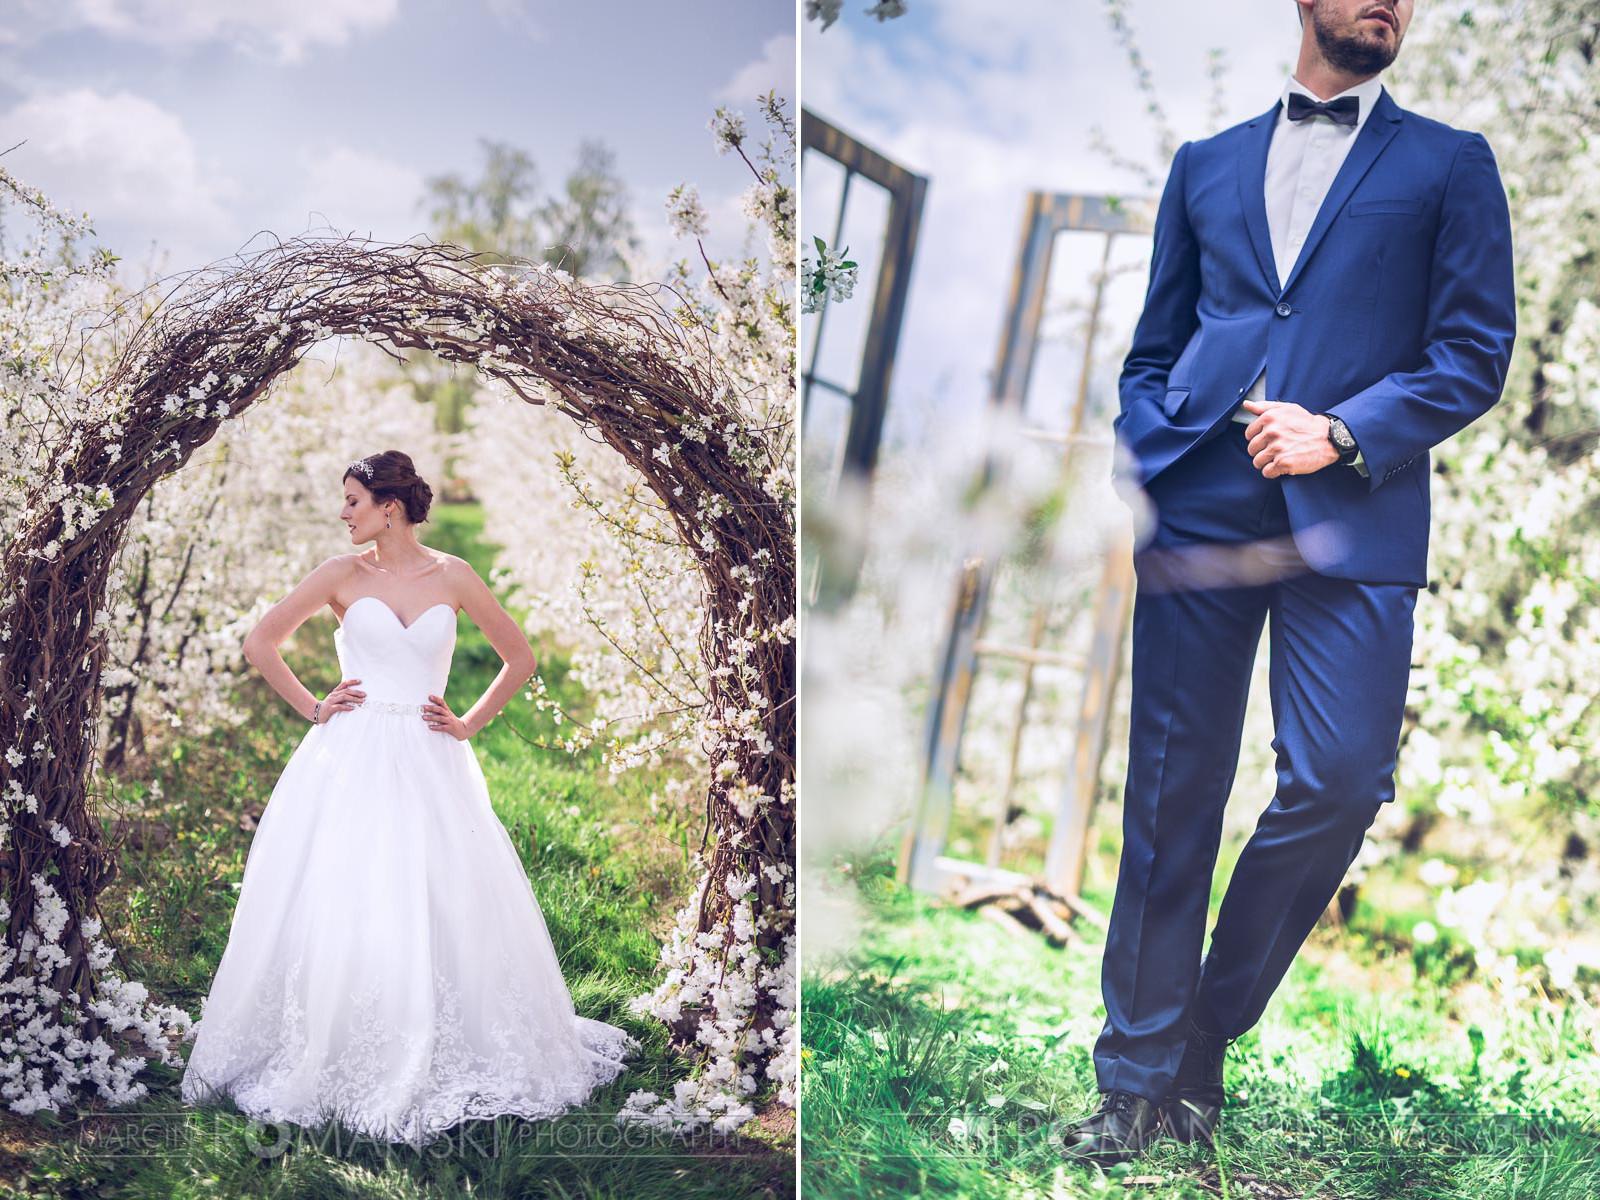 Klasyczna stylizacja ślubna Pary Młodej.